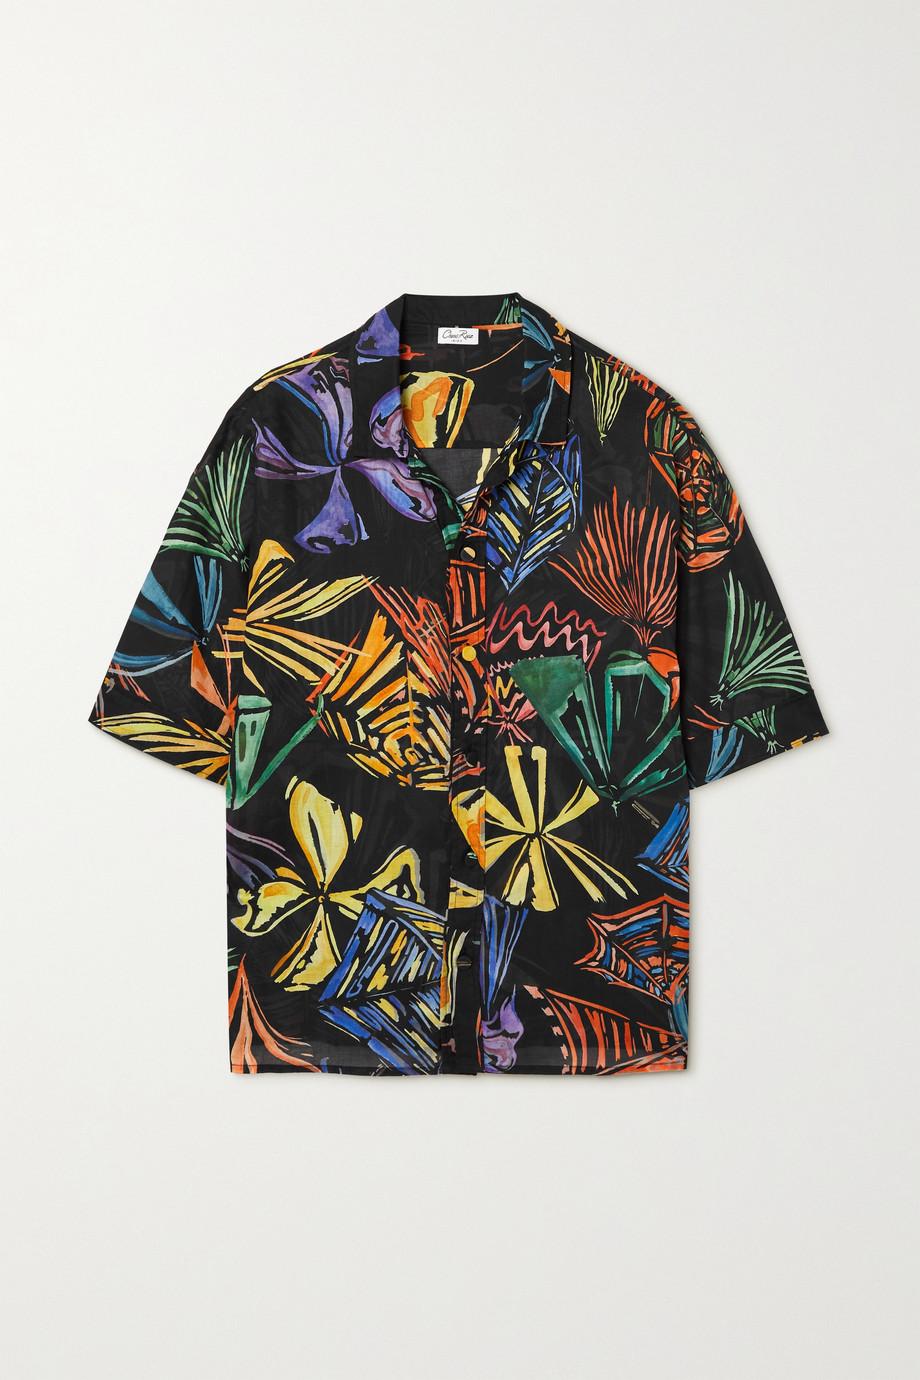 Charo Ruiz Remy printed cotton-voile shirt